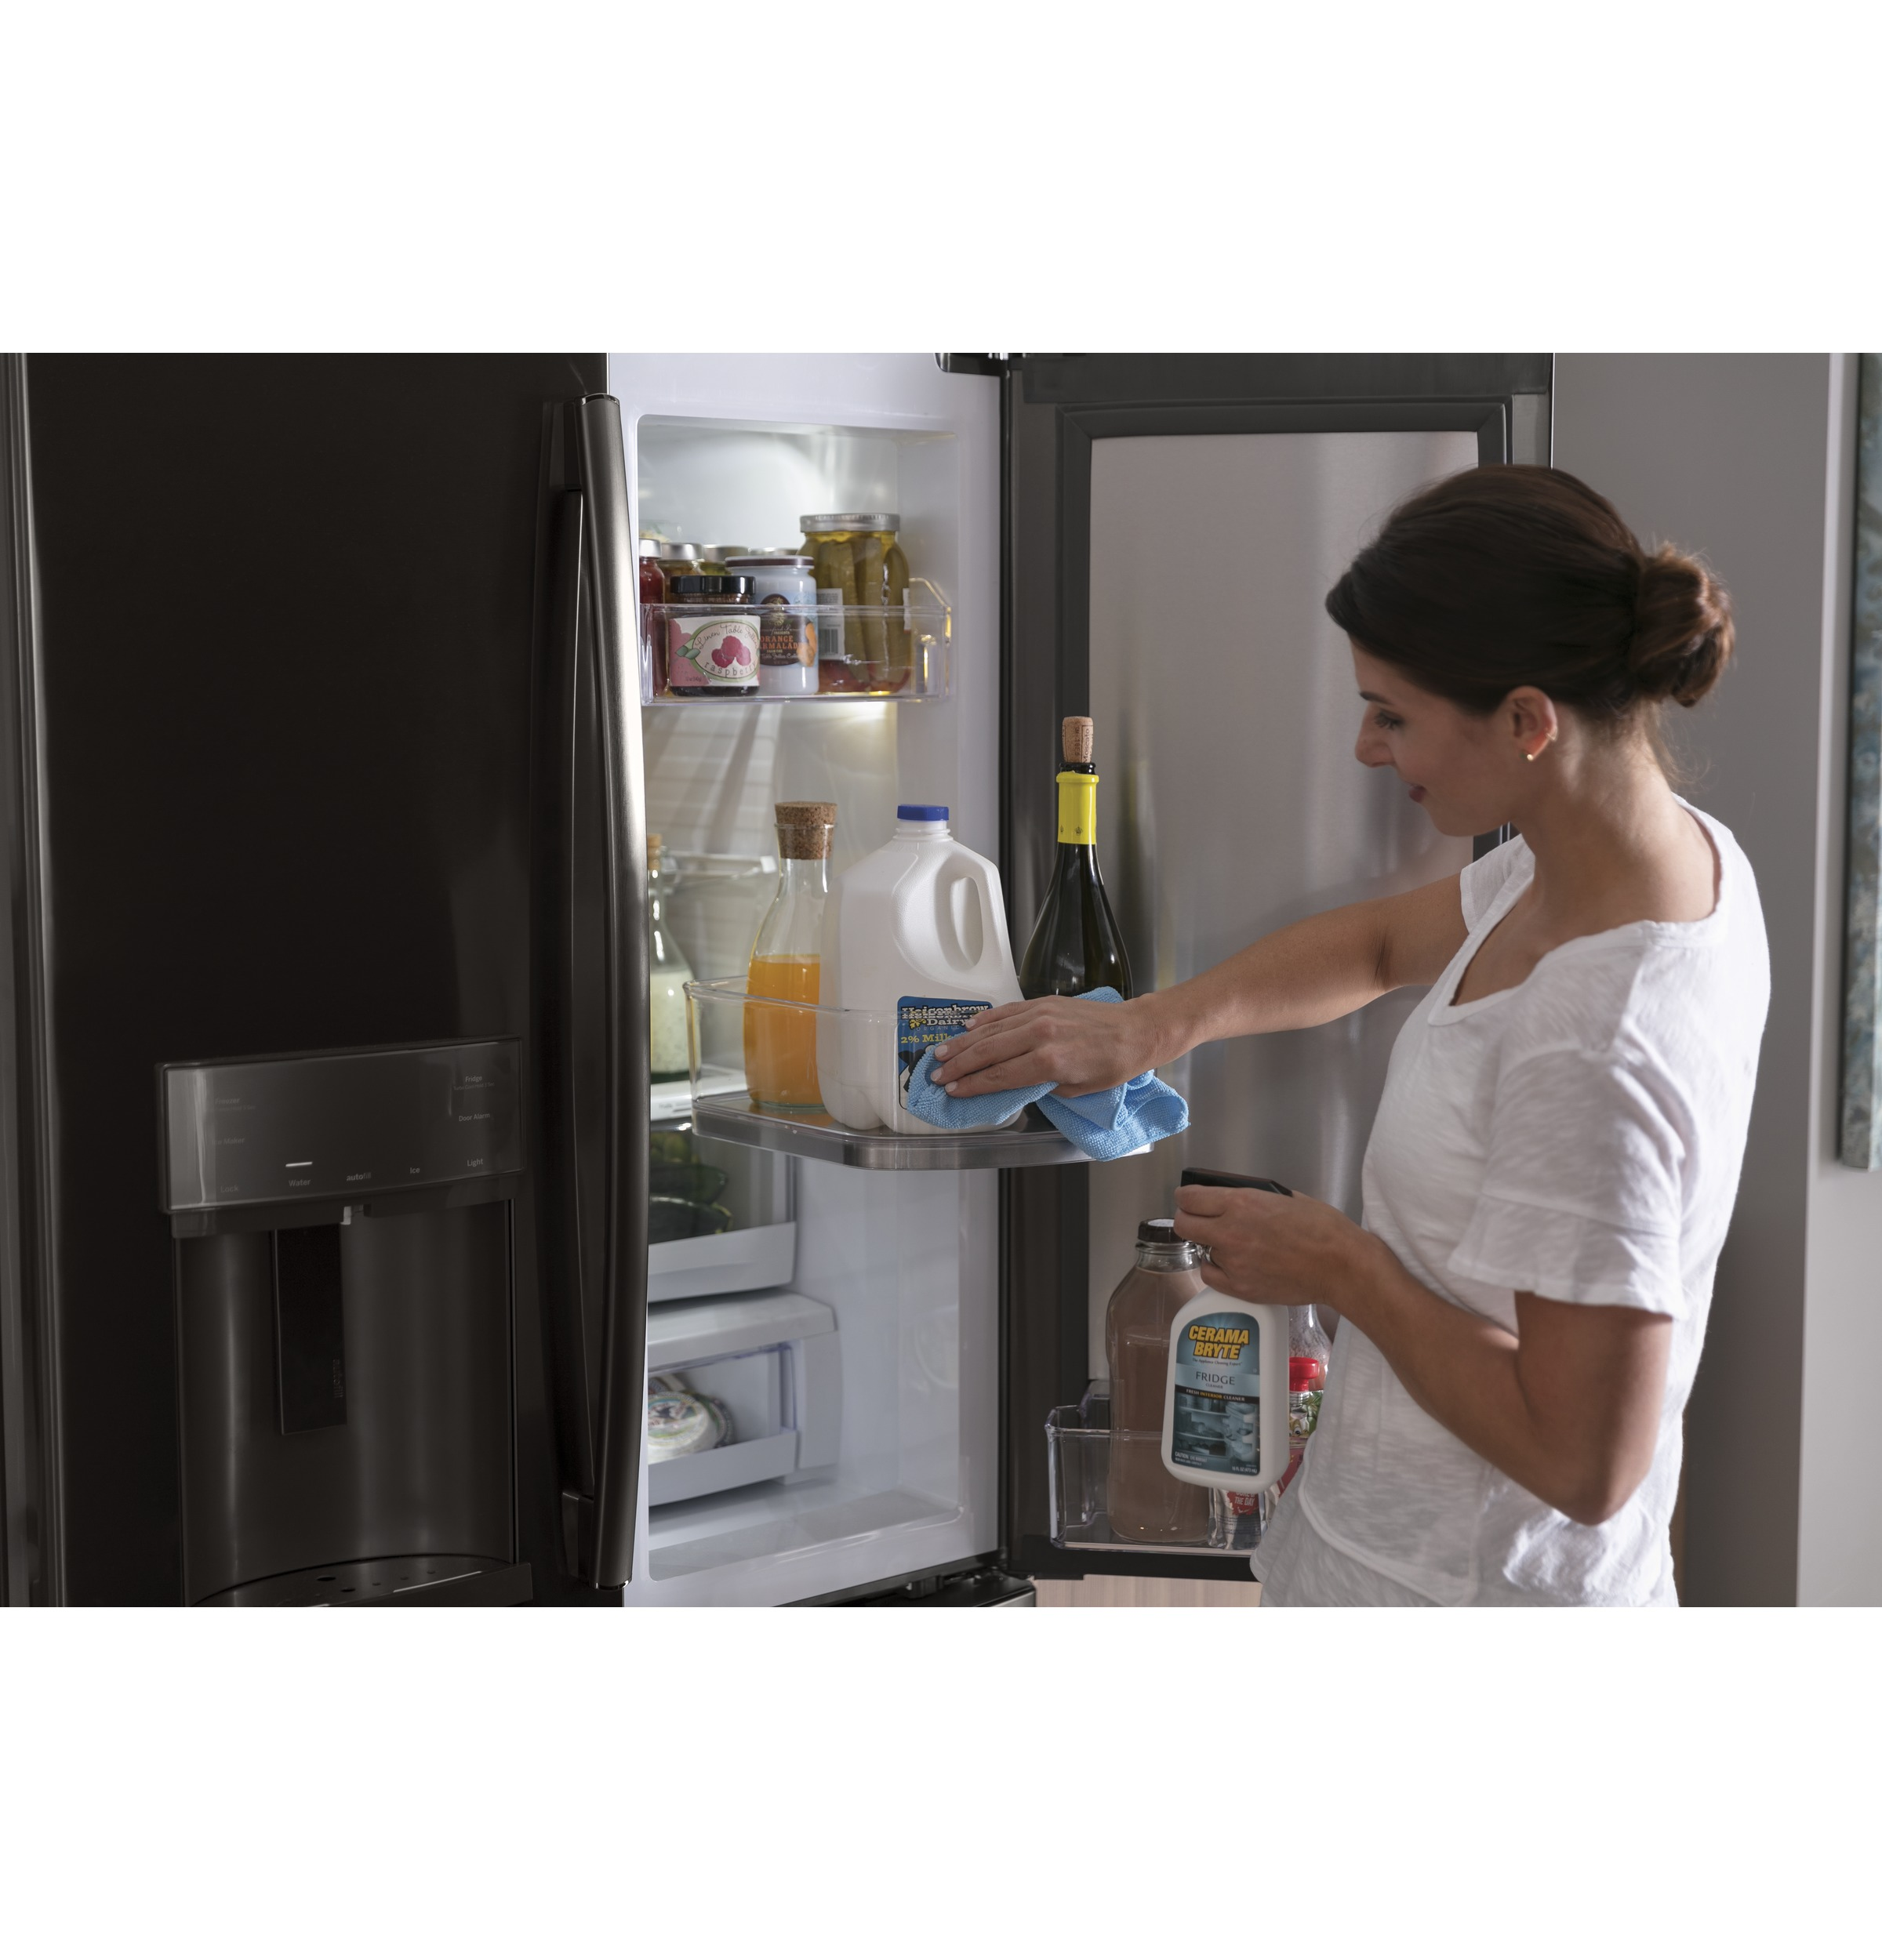 Model: PFD28KBLTS | GE Profile GE Profile™ Series 27.7 Cu. Ft. French-Door Refrigerator with Door In Door and Hands-Free AutoFill